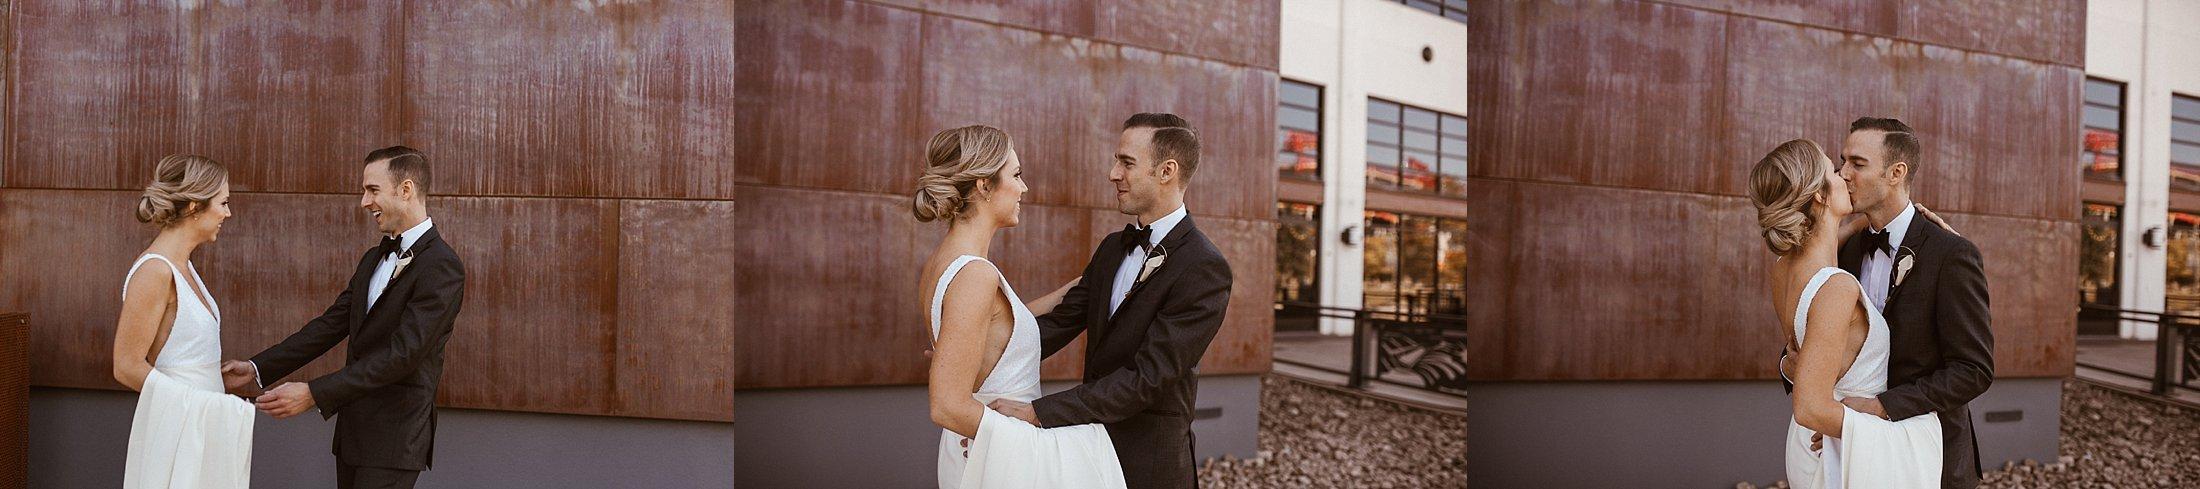 Bridge_Building_Wedding_Photos_Nashville_TN-58.jpg